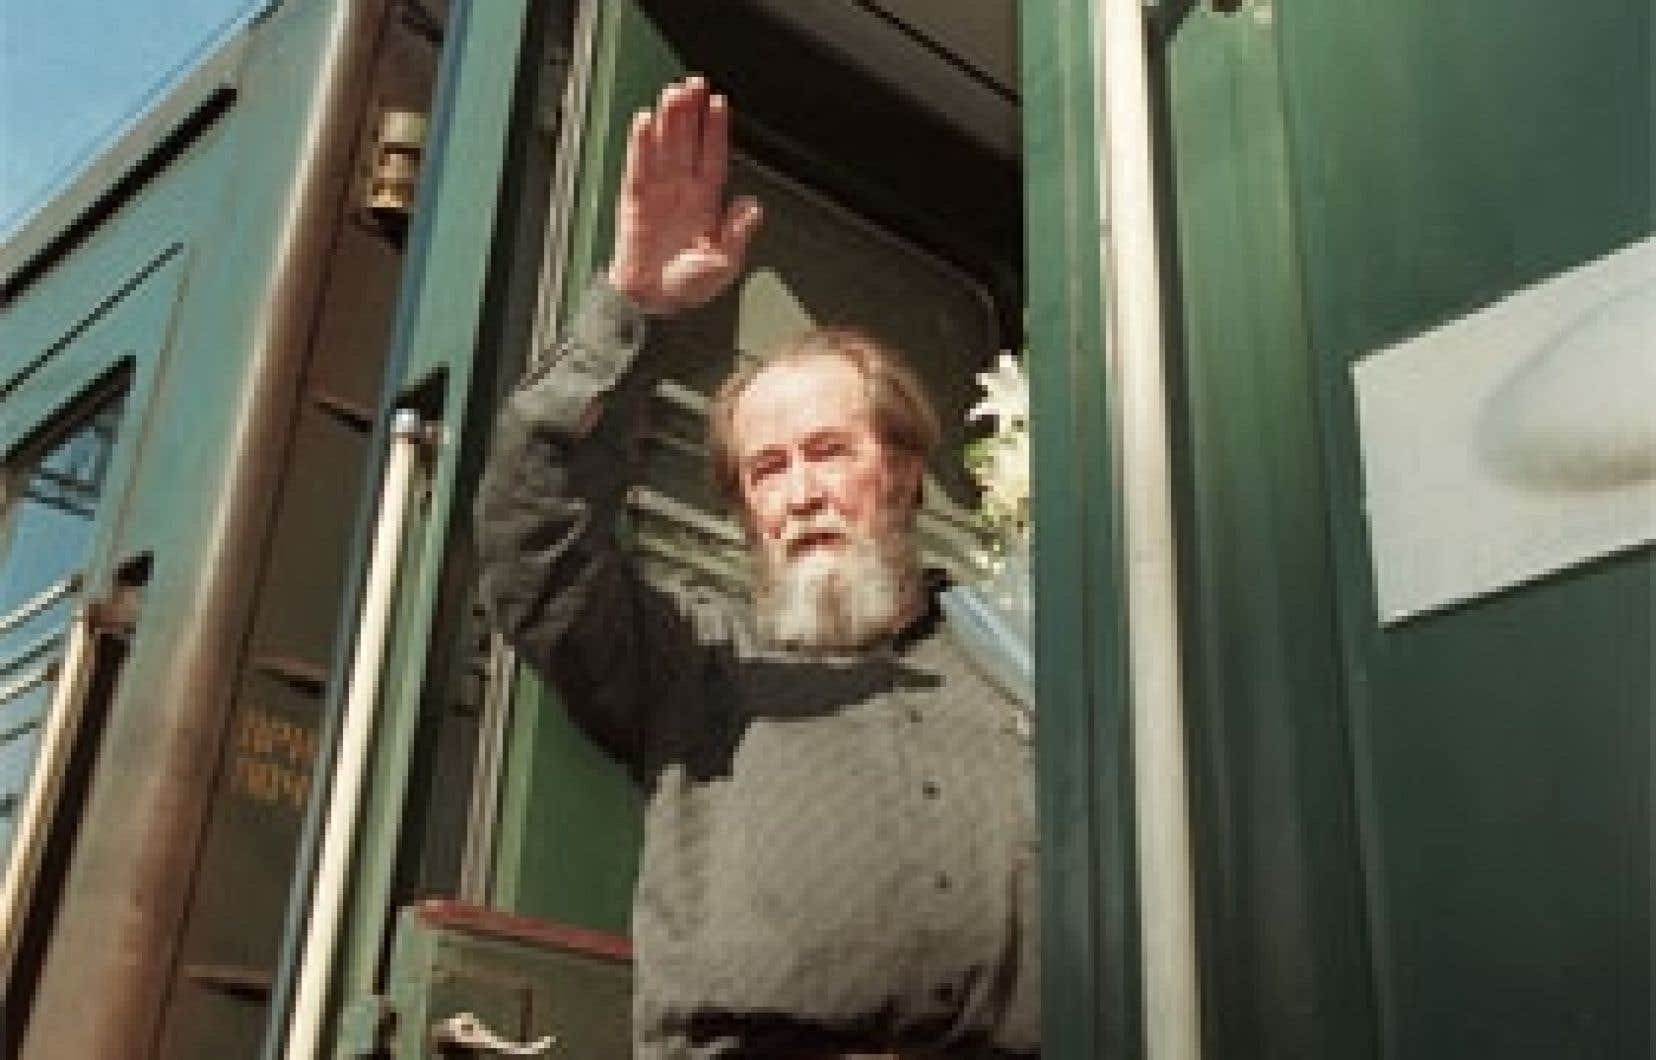 Alexandre Soljenitsyne en 1994, après son retour en Russie, entreprend un voyage triomphal en train transsibérien vers Moscou.